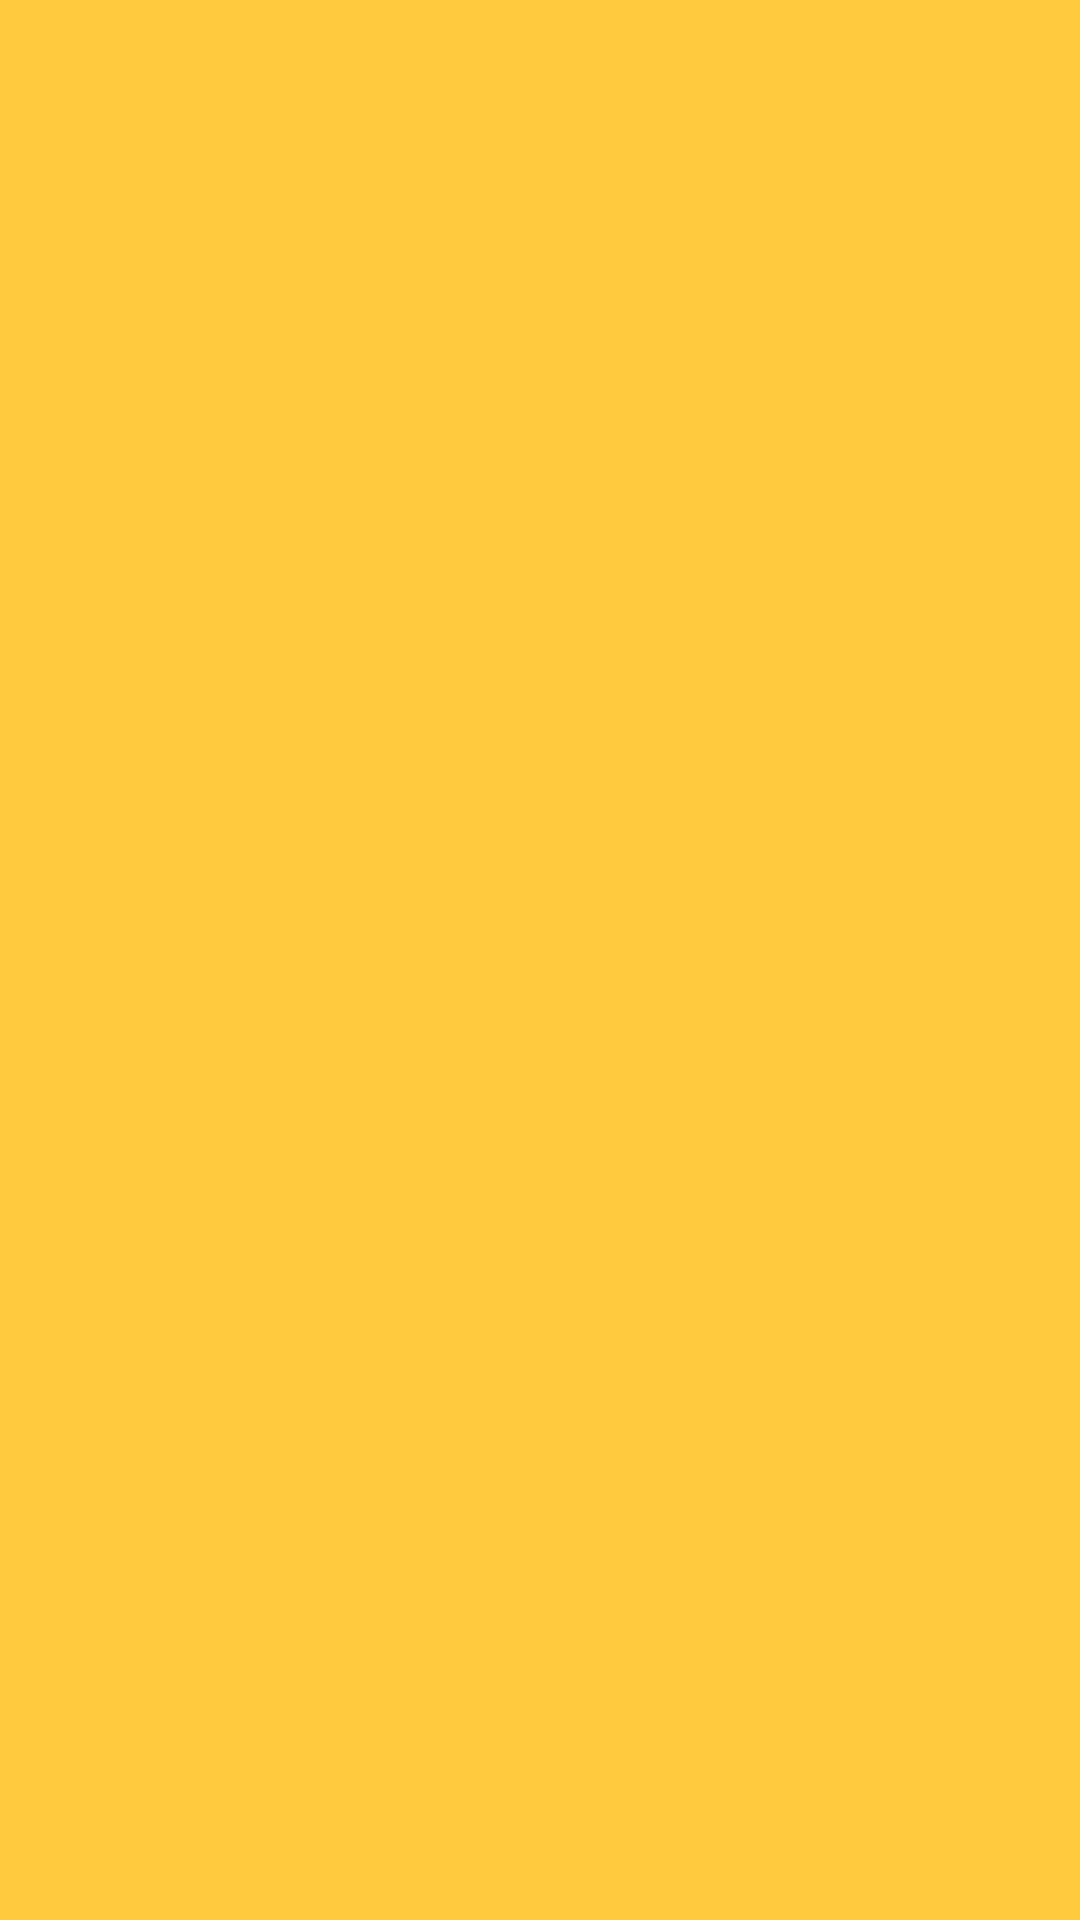 Unique orange and Yellow Paint